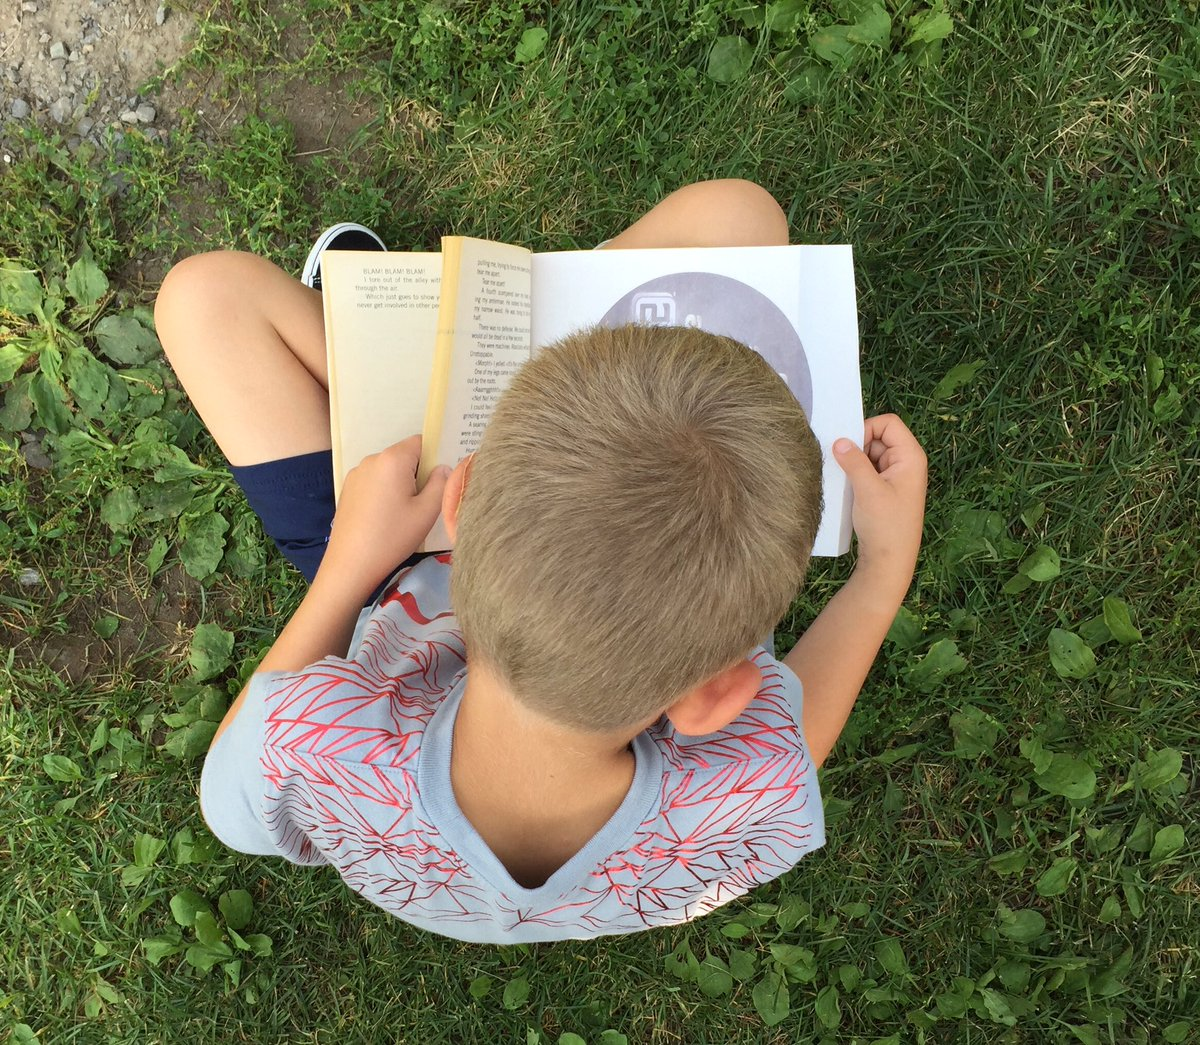 test Twitter Media - Reading outside on a perfect day!#ottawaschools #natureschool#summeratlast https://t.co/LJsKsLDjEA